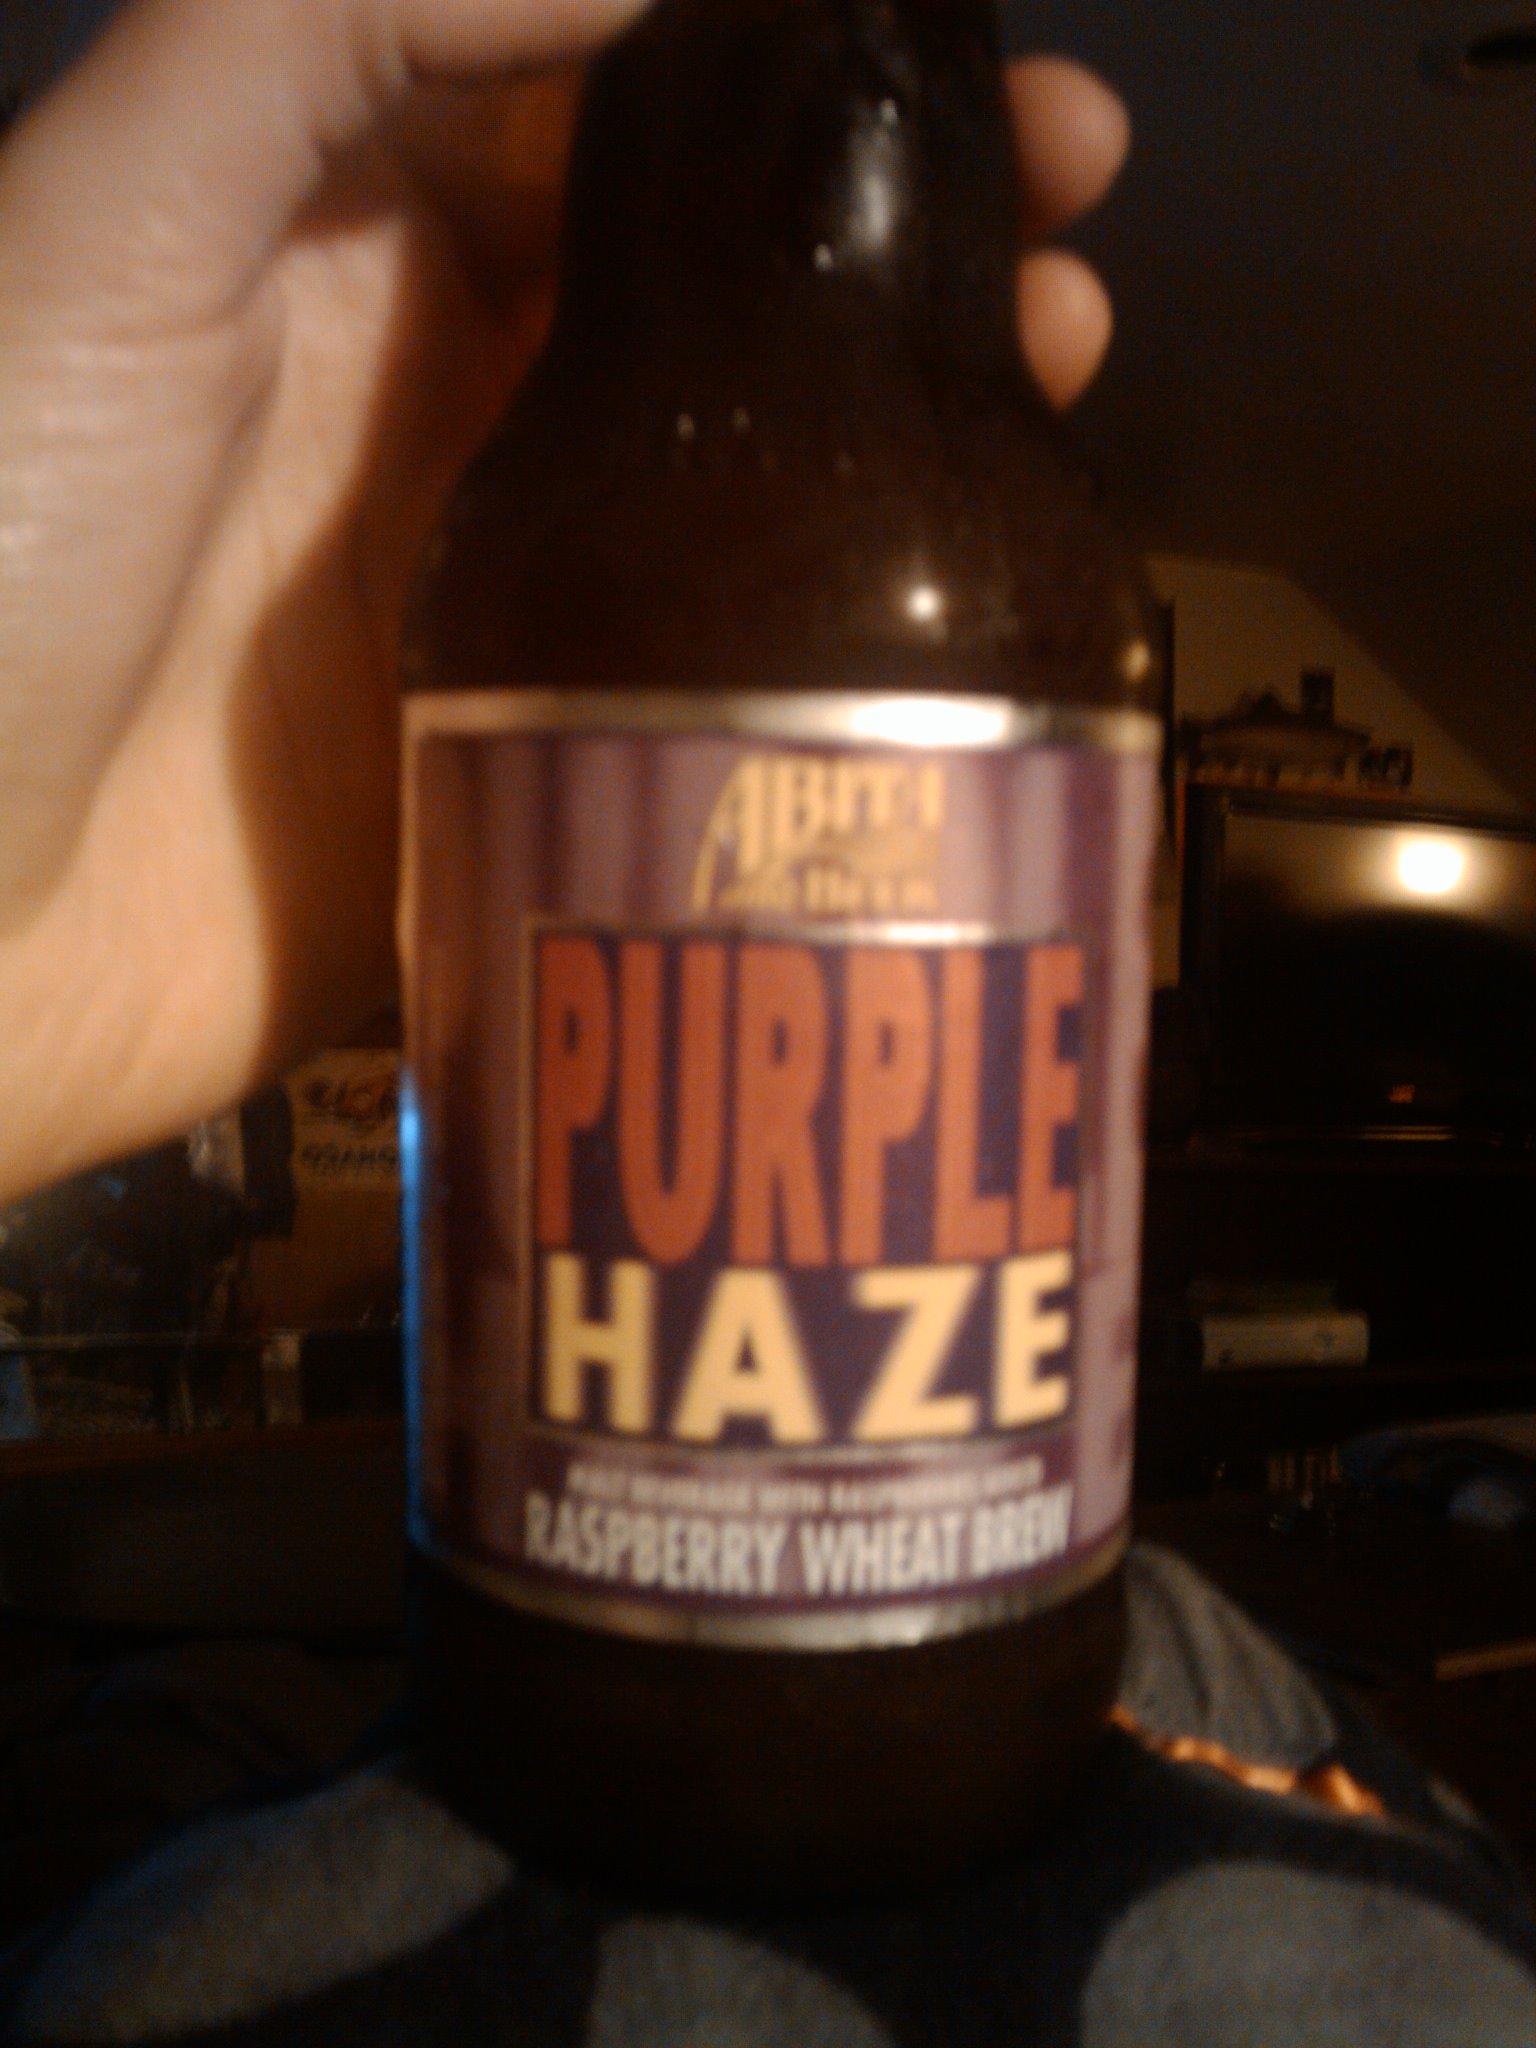 1St Ward :: Anita Beer Purple Haze Raspberry Wheat Brew... Yummy Carolita would agree =)